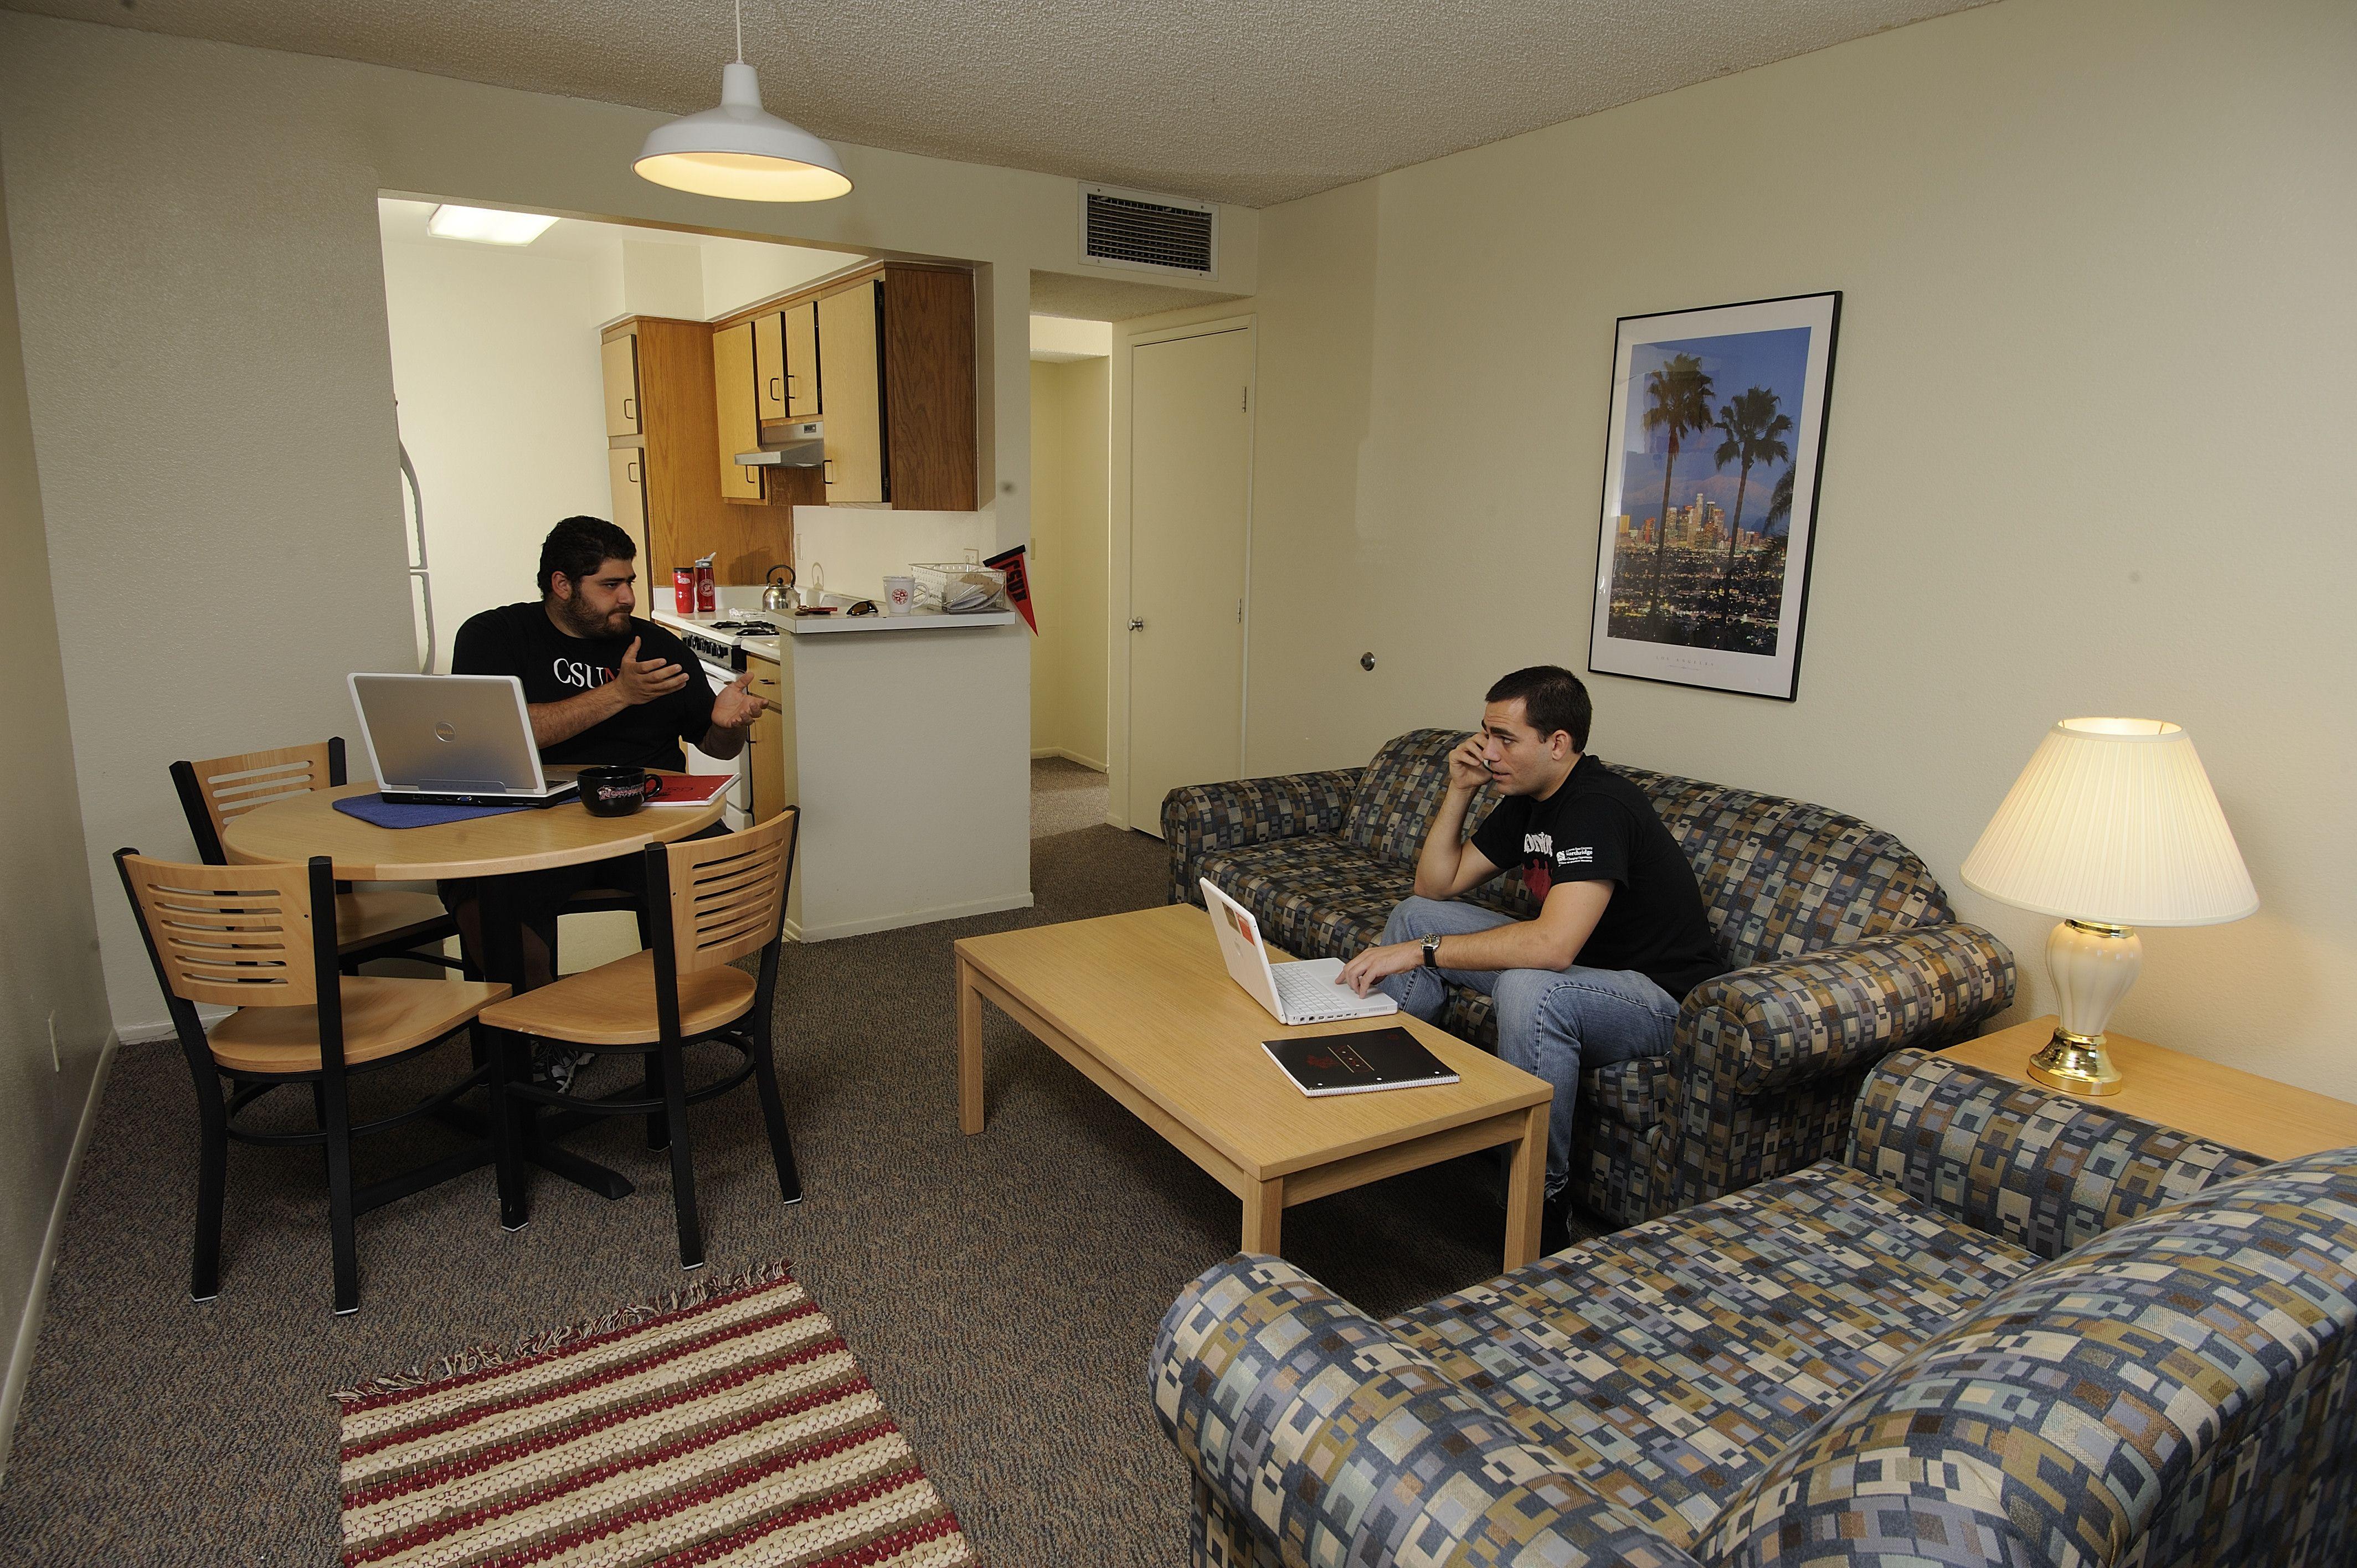 Csun Apartments Offer Ious Living